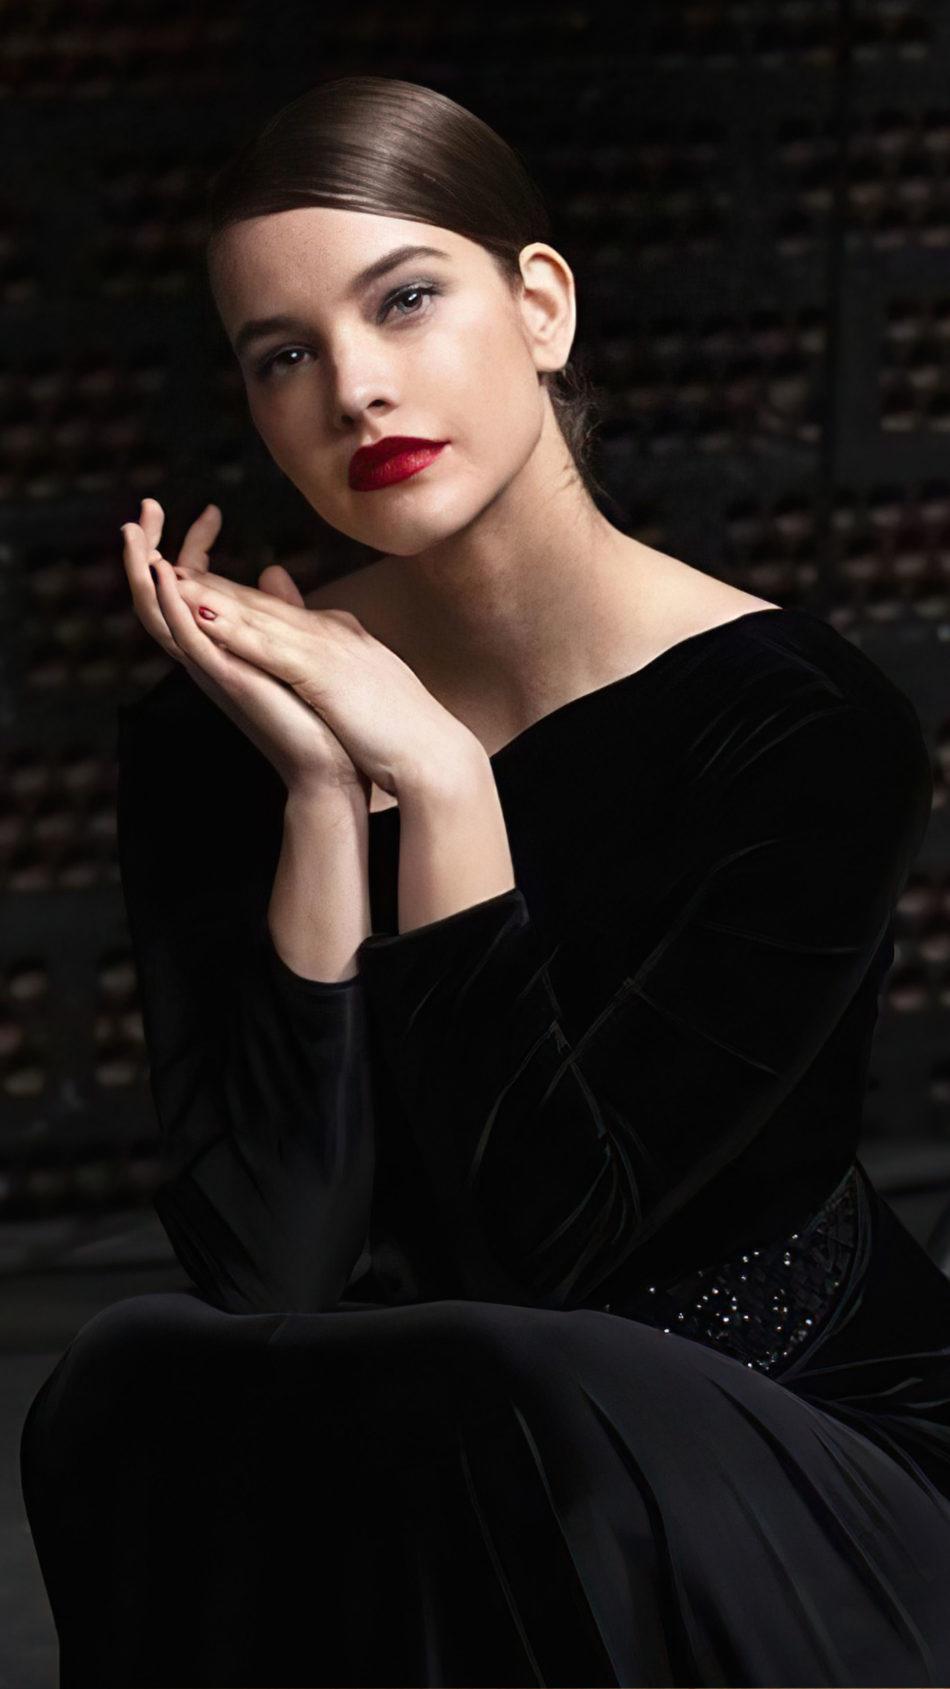 Barbara Palvin 2020 Red Lips Black Dress 4K Ultra HD Mobile Wallpaper